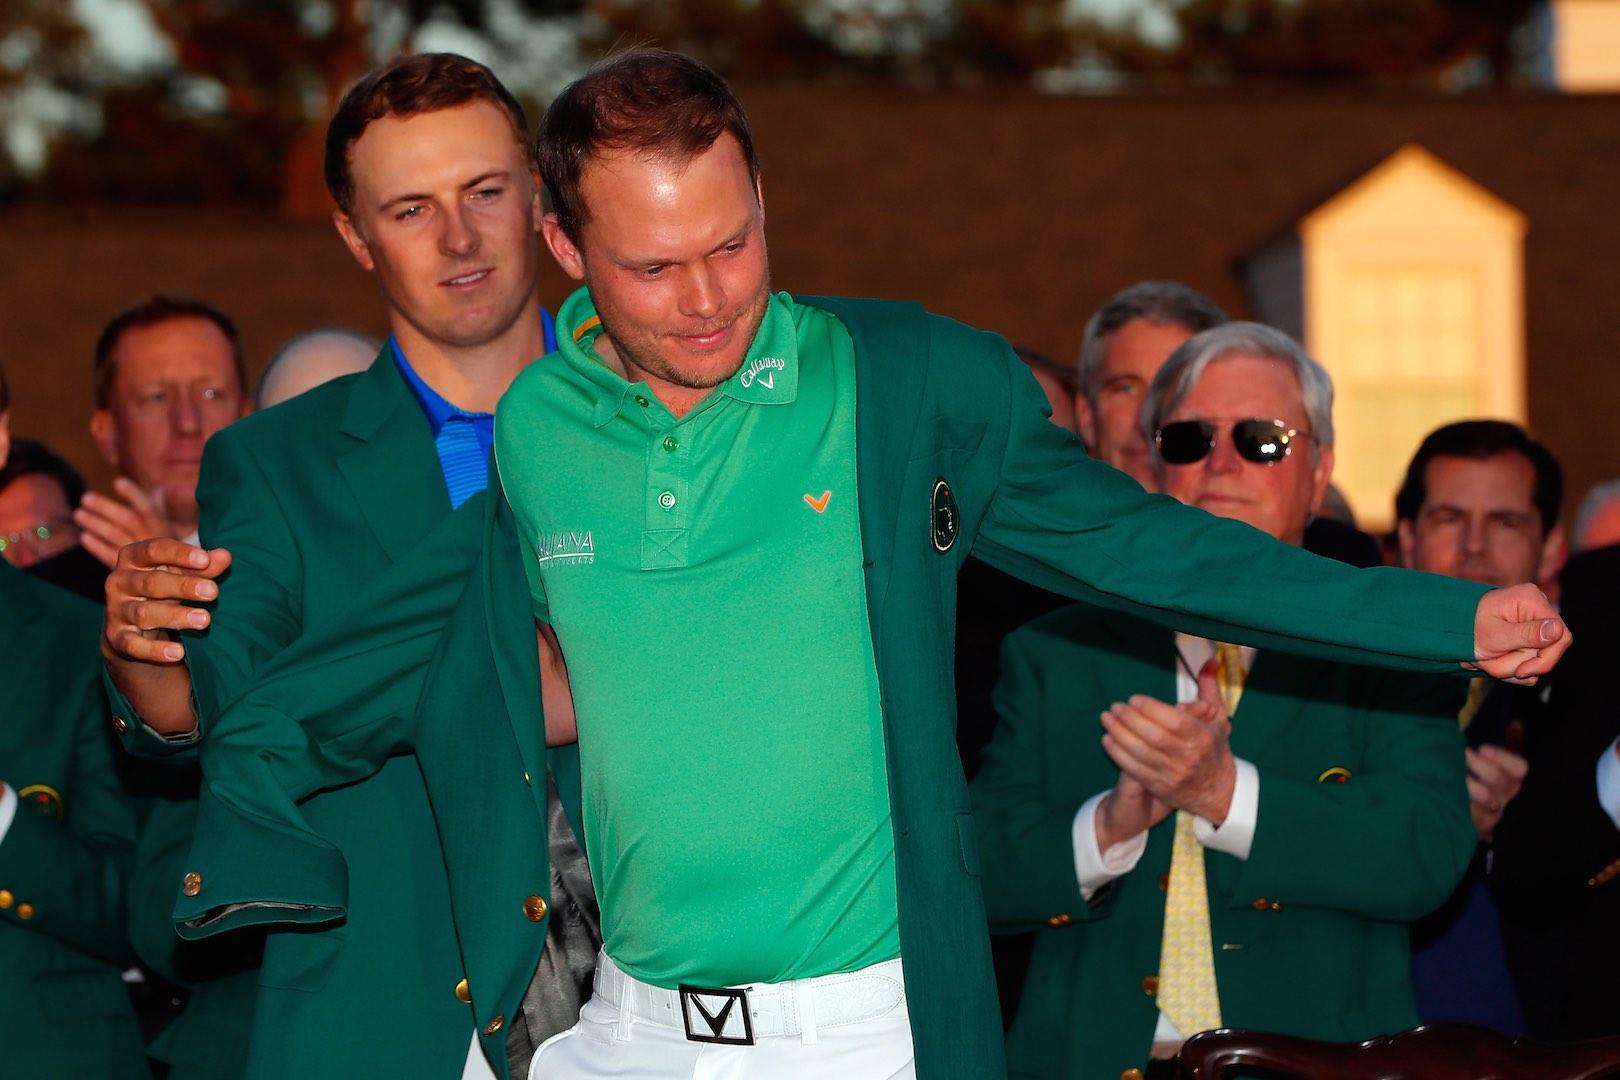 Jordan & Danny's Green Jacket Grapple